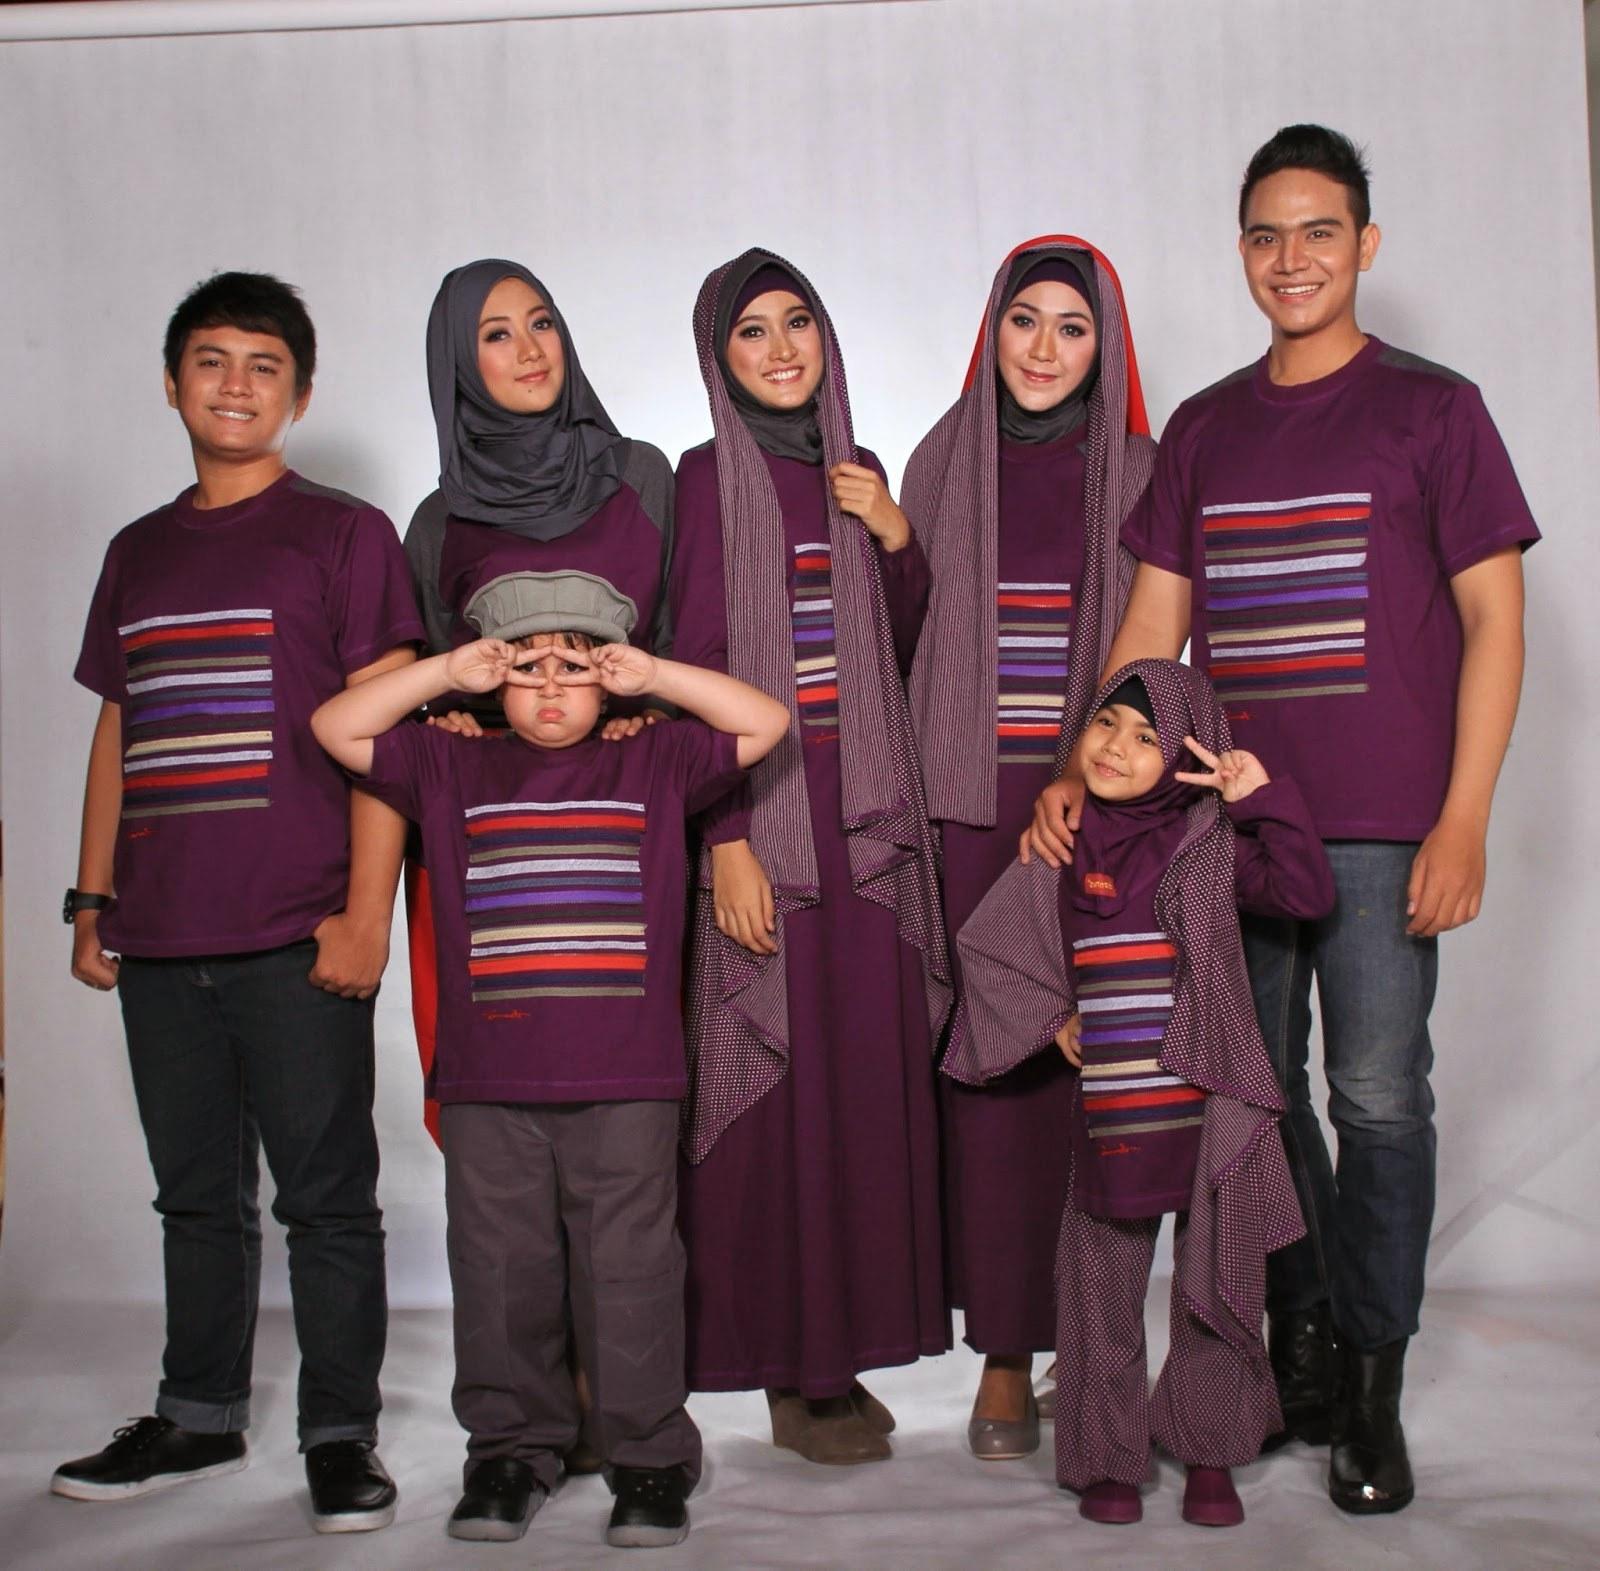 Design Baju Lebaran Pria 2018 Dwdk Model Baju Keluarga Untuk Hari Raya Lebaran 2018